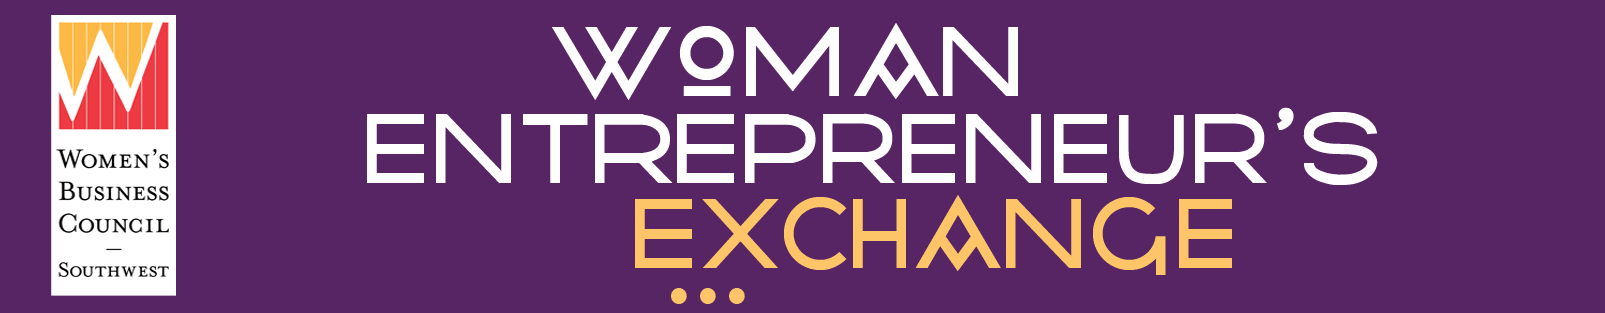 WBCS-womens-entrepreneur-exchange.png